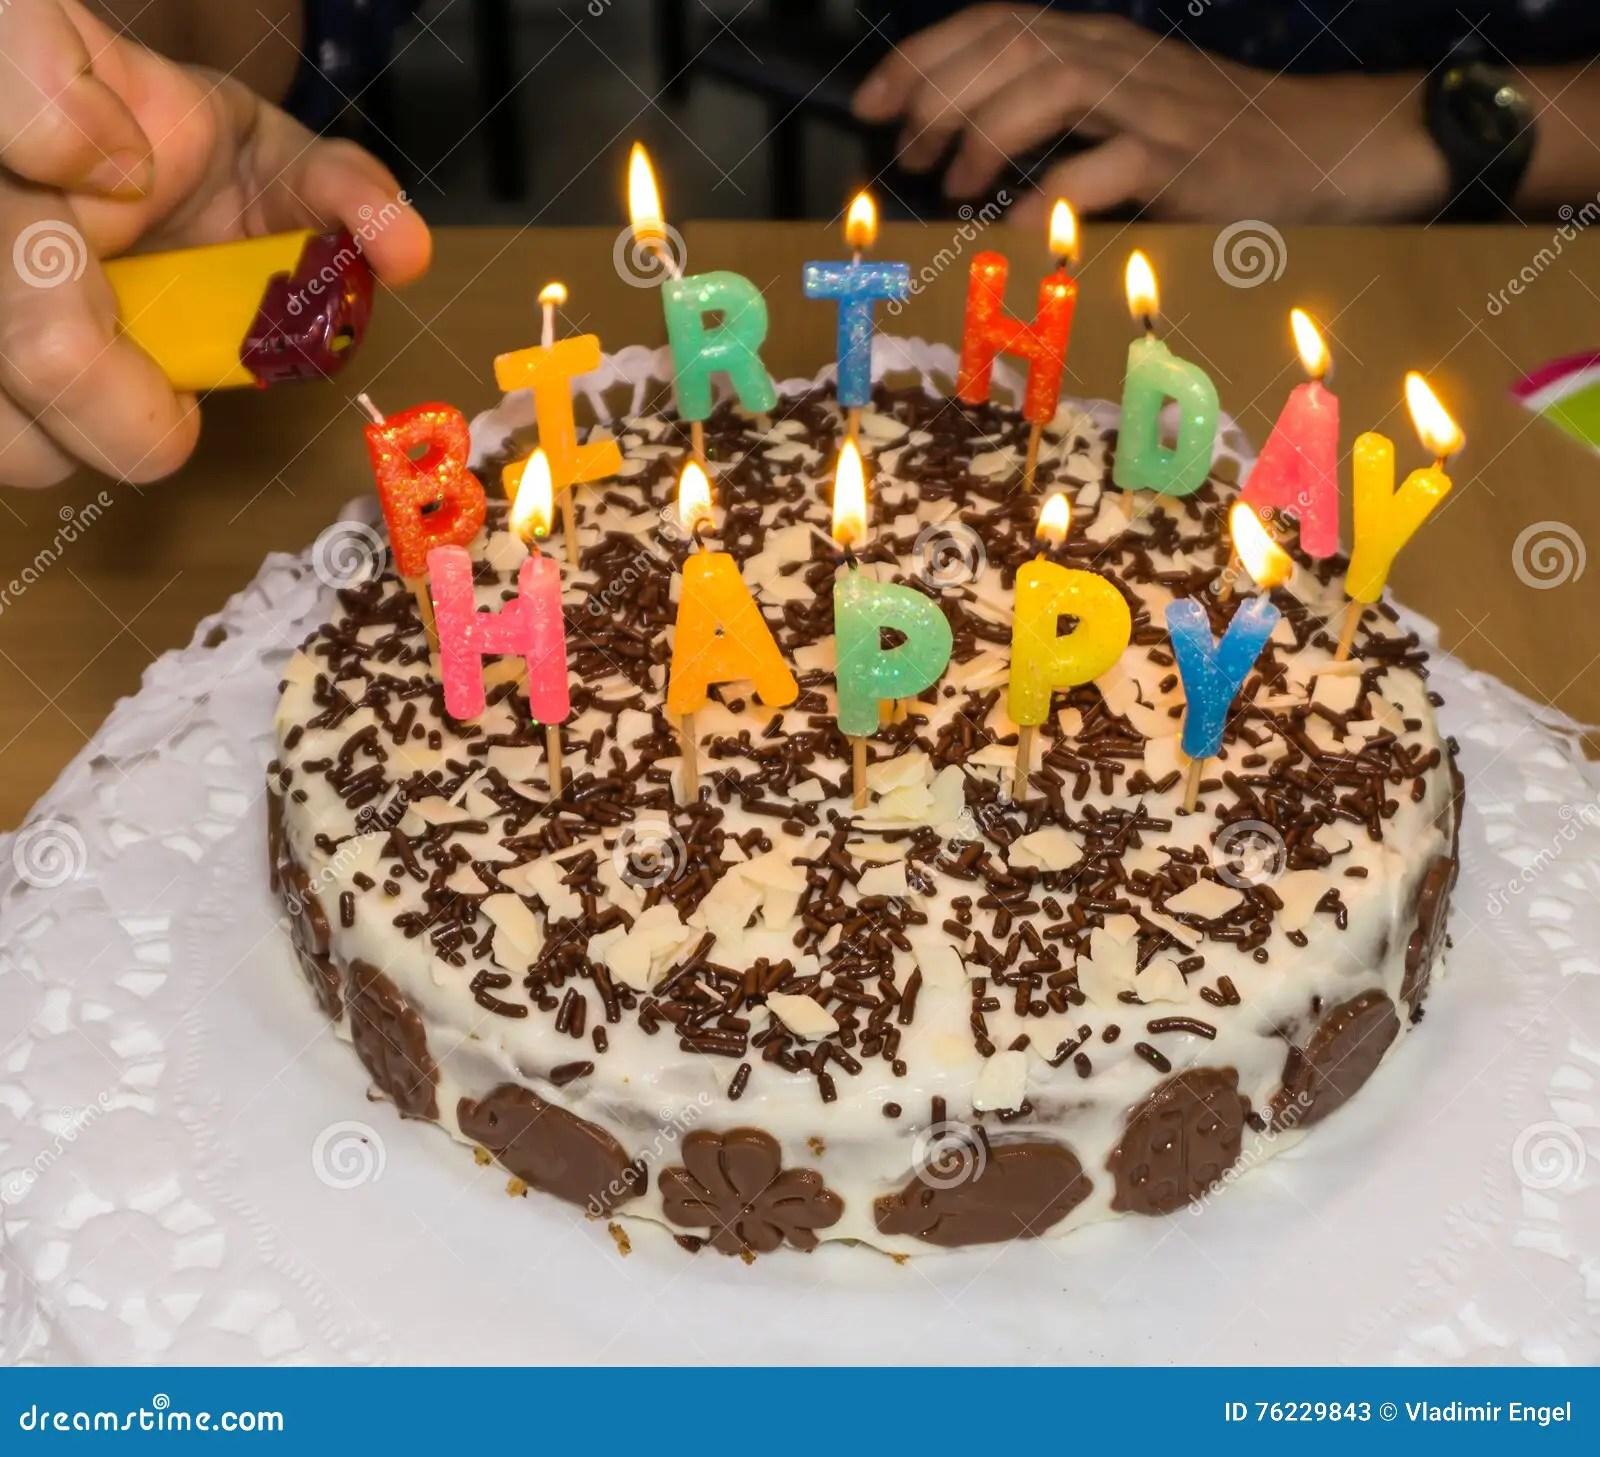 Candlelight Homemade Birthday Cake Fire Stock Image Image Of